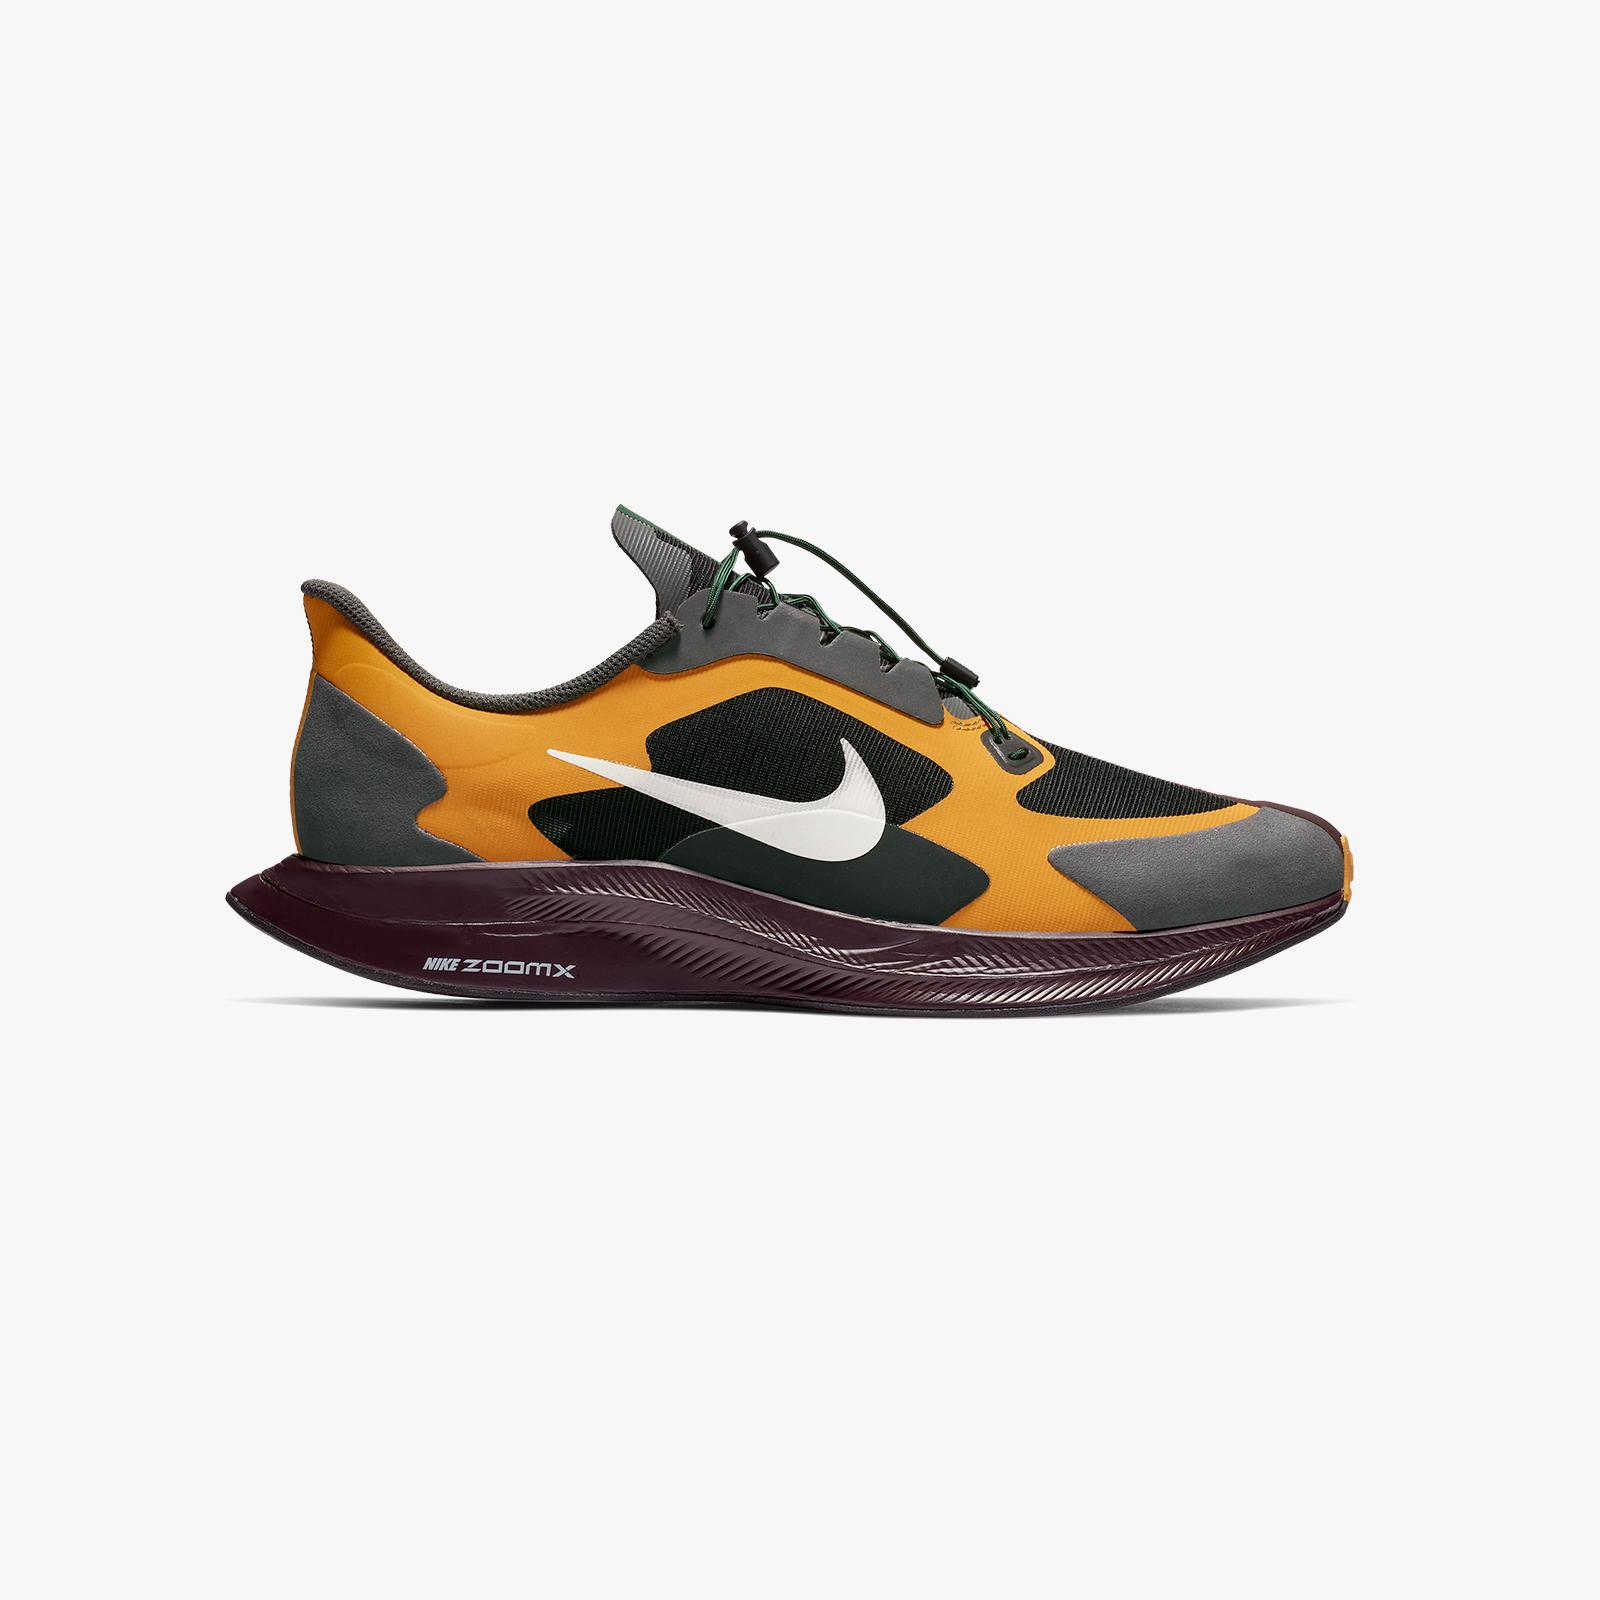 fa545b017f0c5 Nike Zoom Pegasus 35 Turbo x Gyakusou - Bq0579-700 - Sneakersnstuff ...